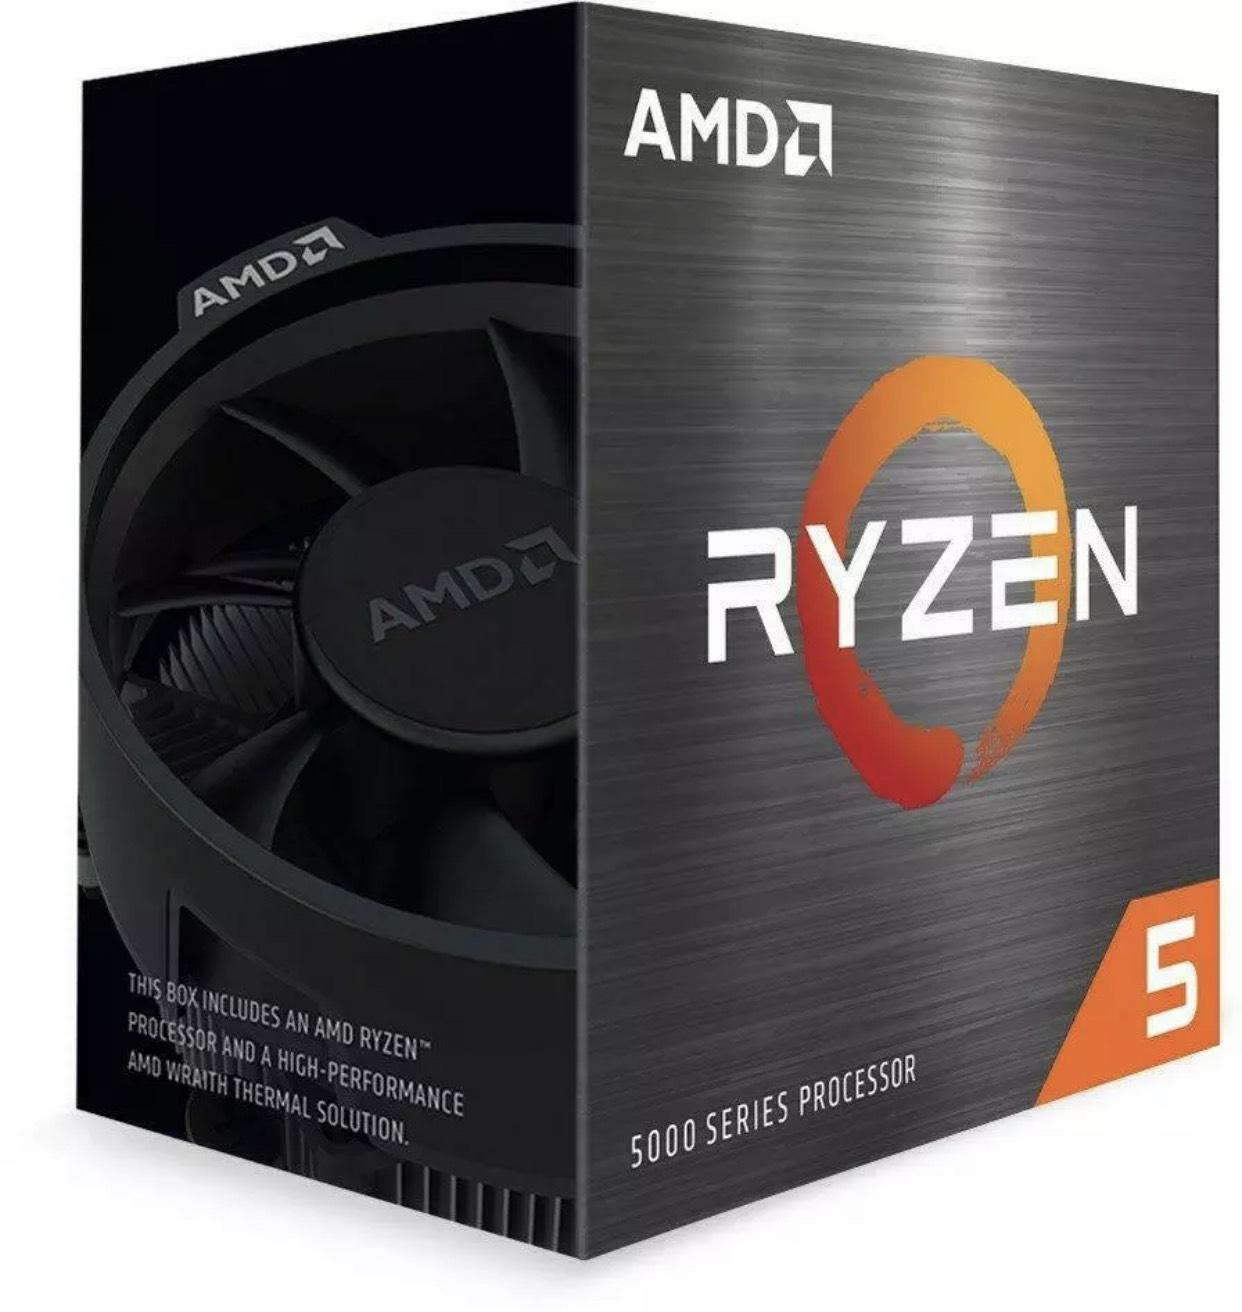 AMD Ryzen 5 5600X 3.7GHz/4.6GHz 6 Core (Socket AM4) CPU Processor £271.99 at tabretail ebay